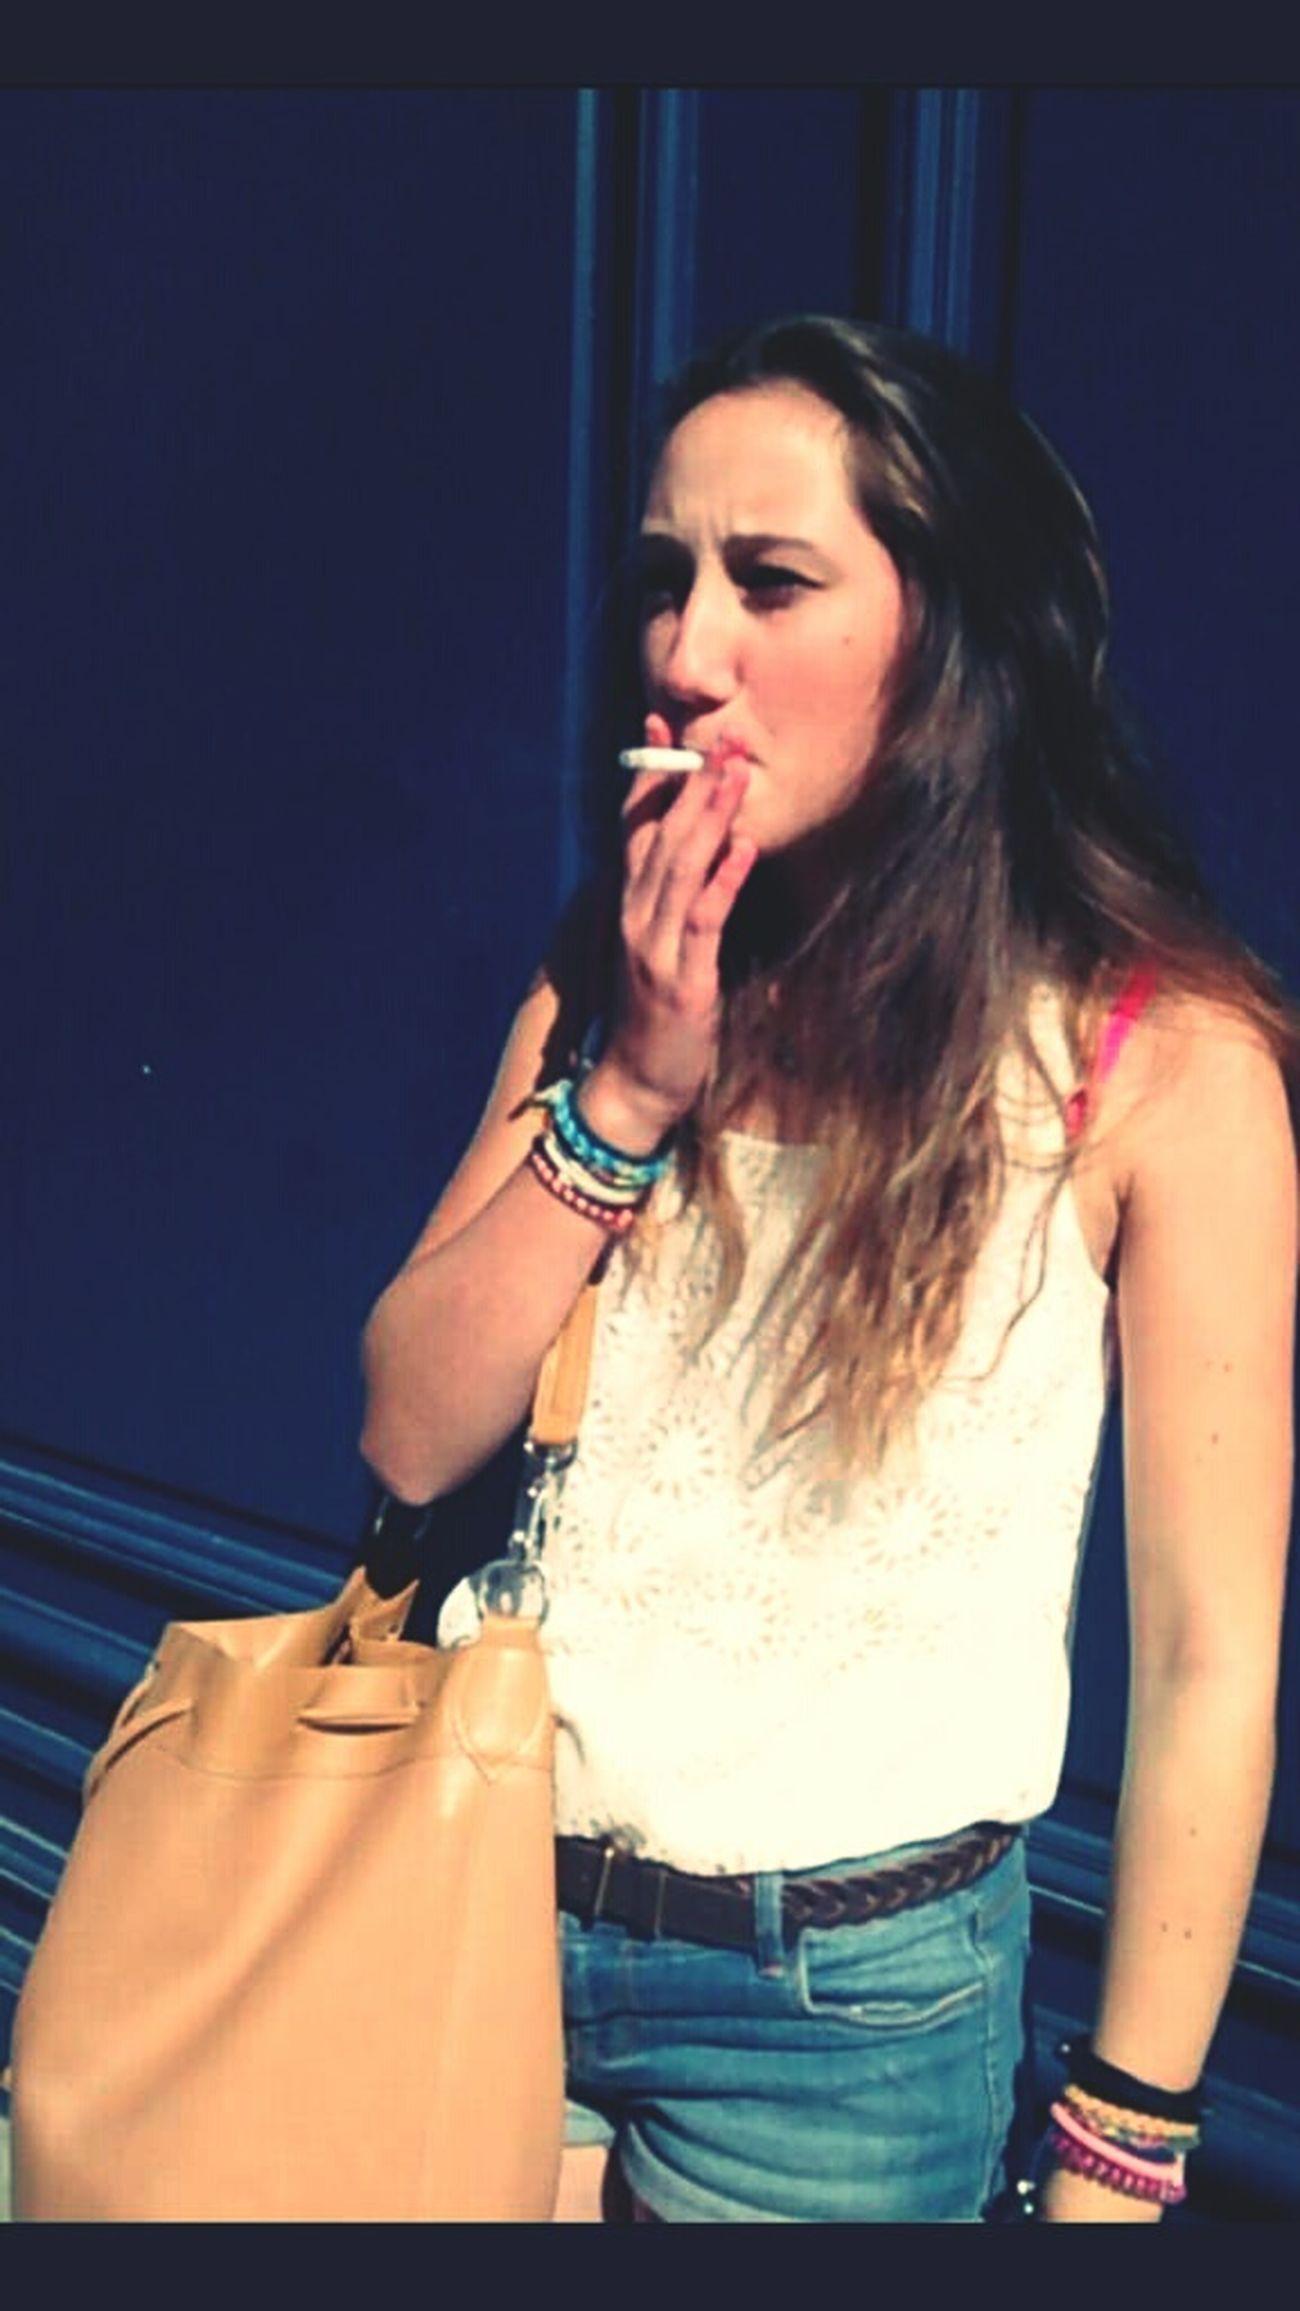 Smoke Everyday Smoke Time Good Times Everyday SMOKE WEED EVERYDAY Smoke